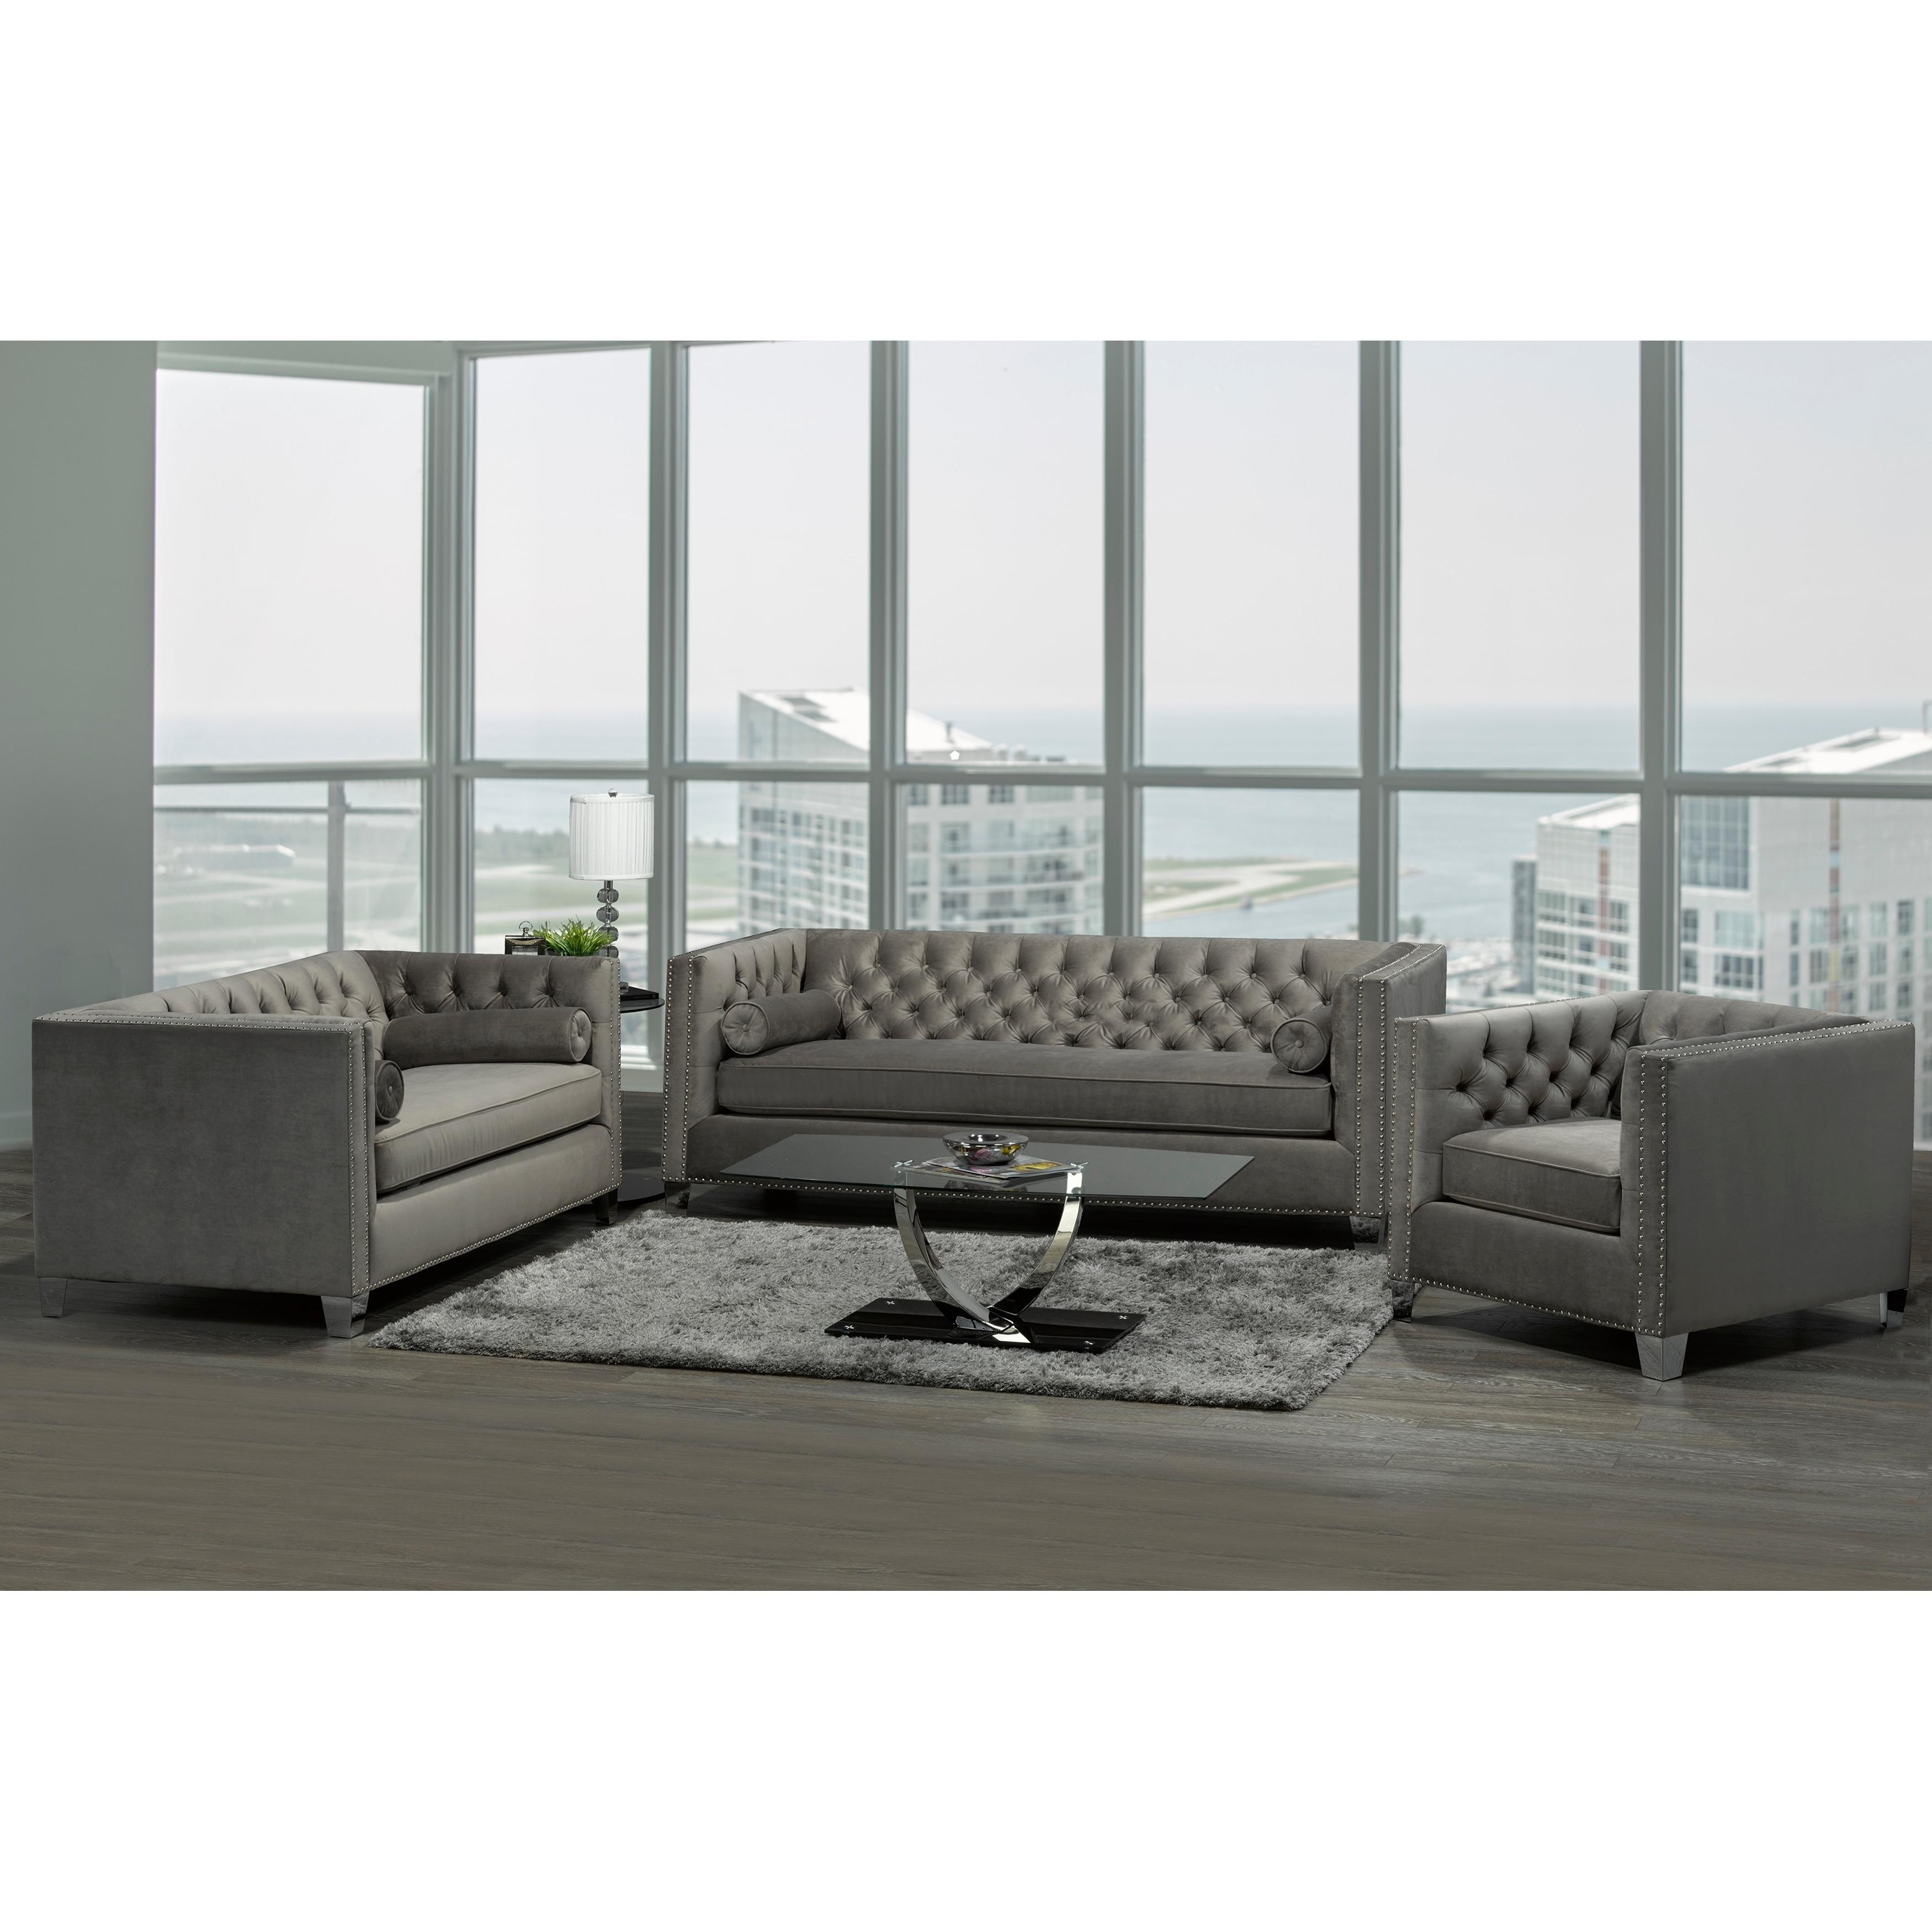 Hank Modern Grey Velvet Tufted Nailhead Sofa, Loveseat and Chair - Natural